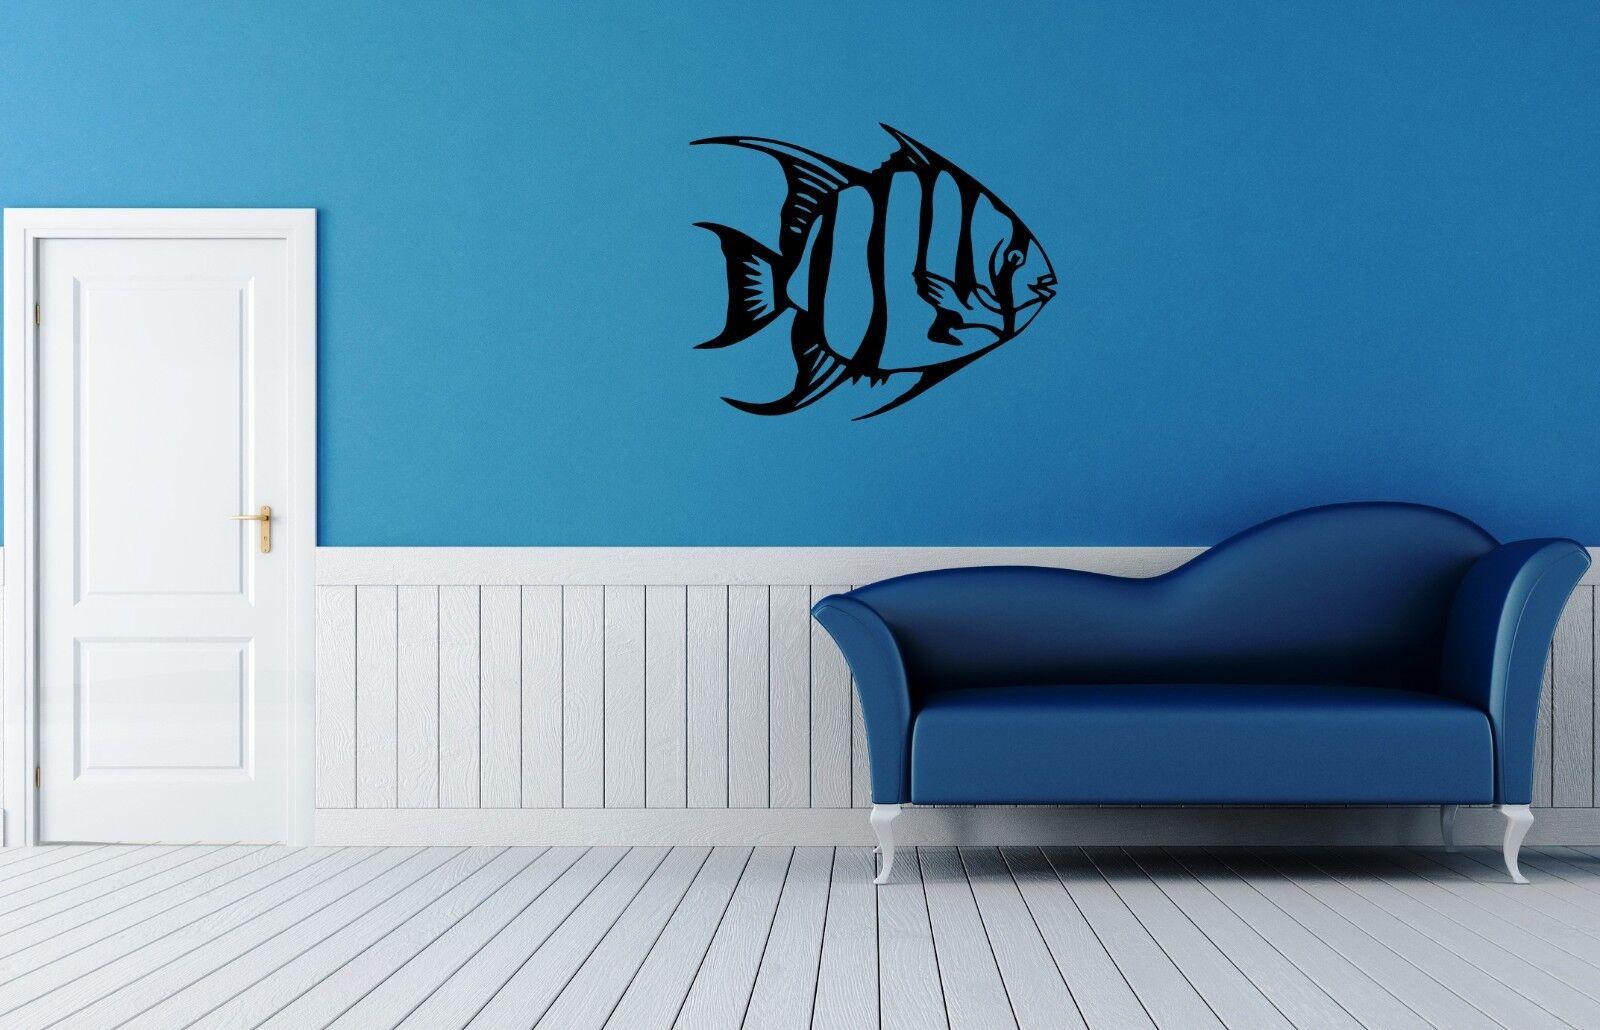 Wall Stickers Vinyl Decal Fish For Bathroom Ocean Sea Marine Animal